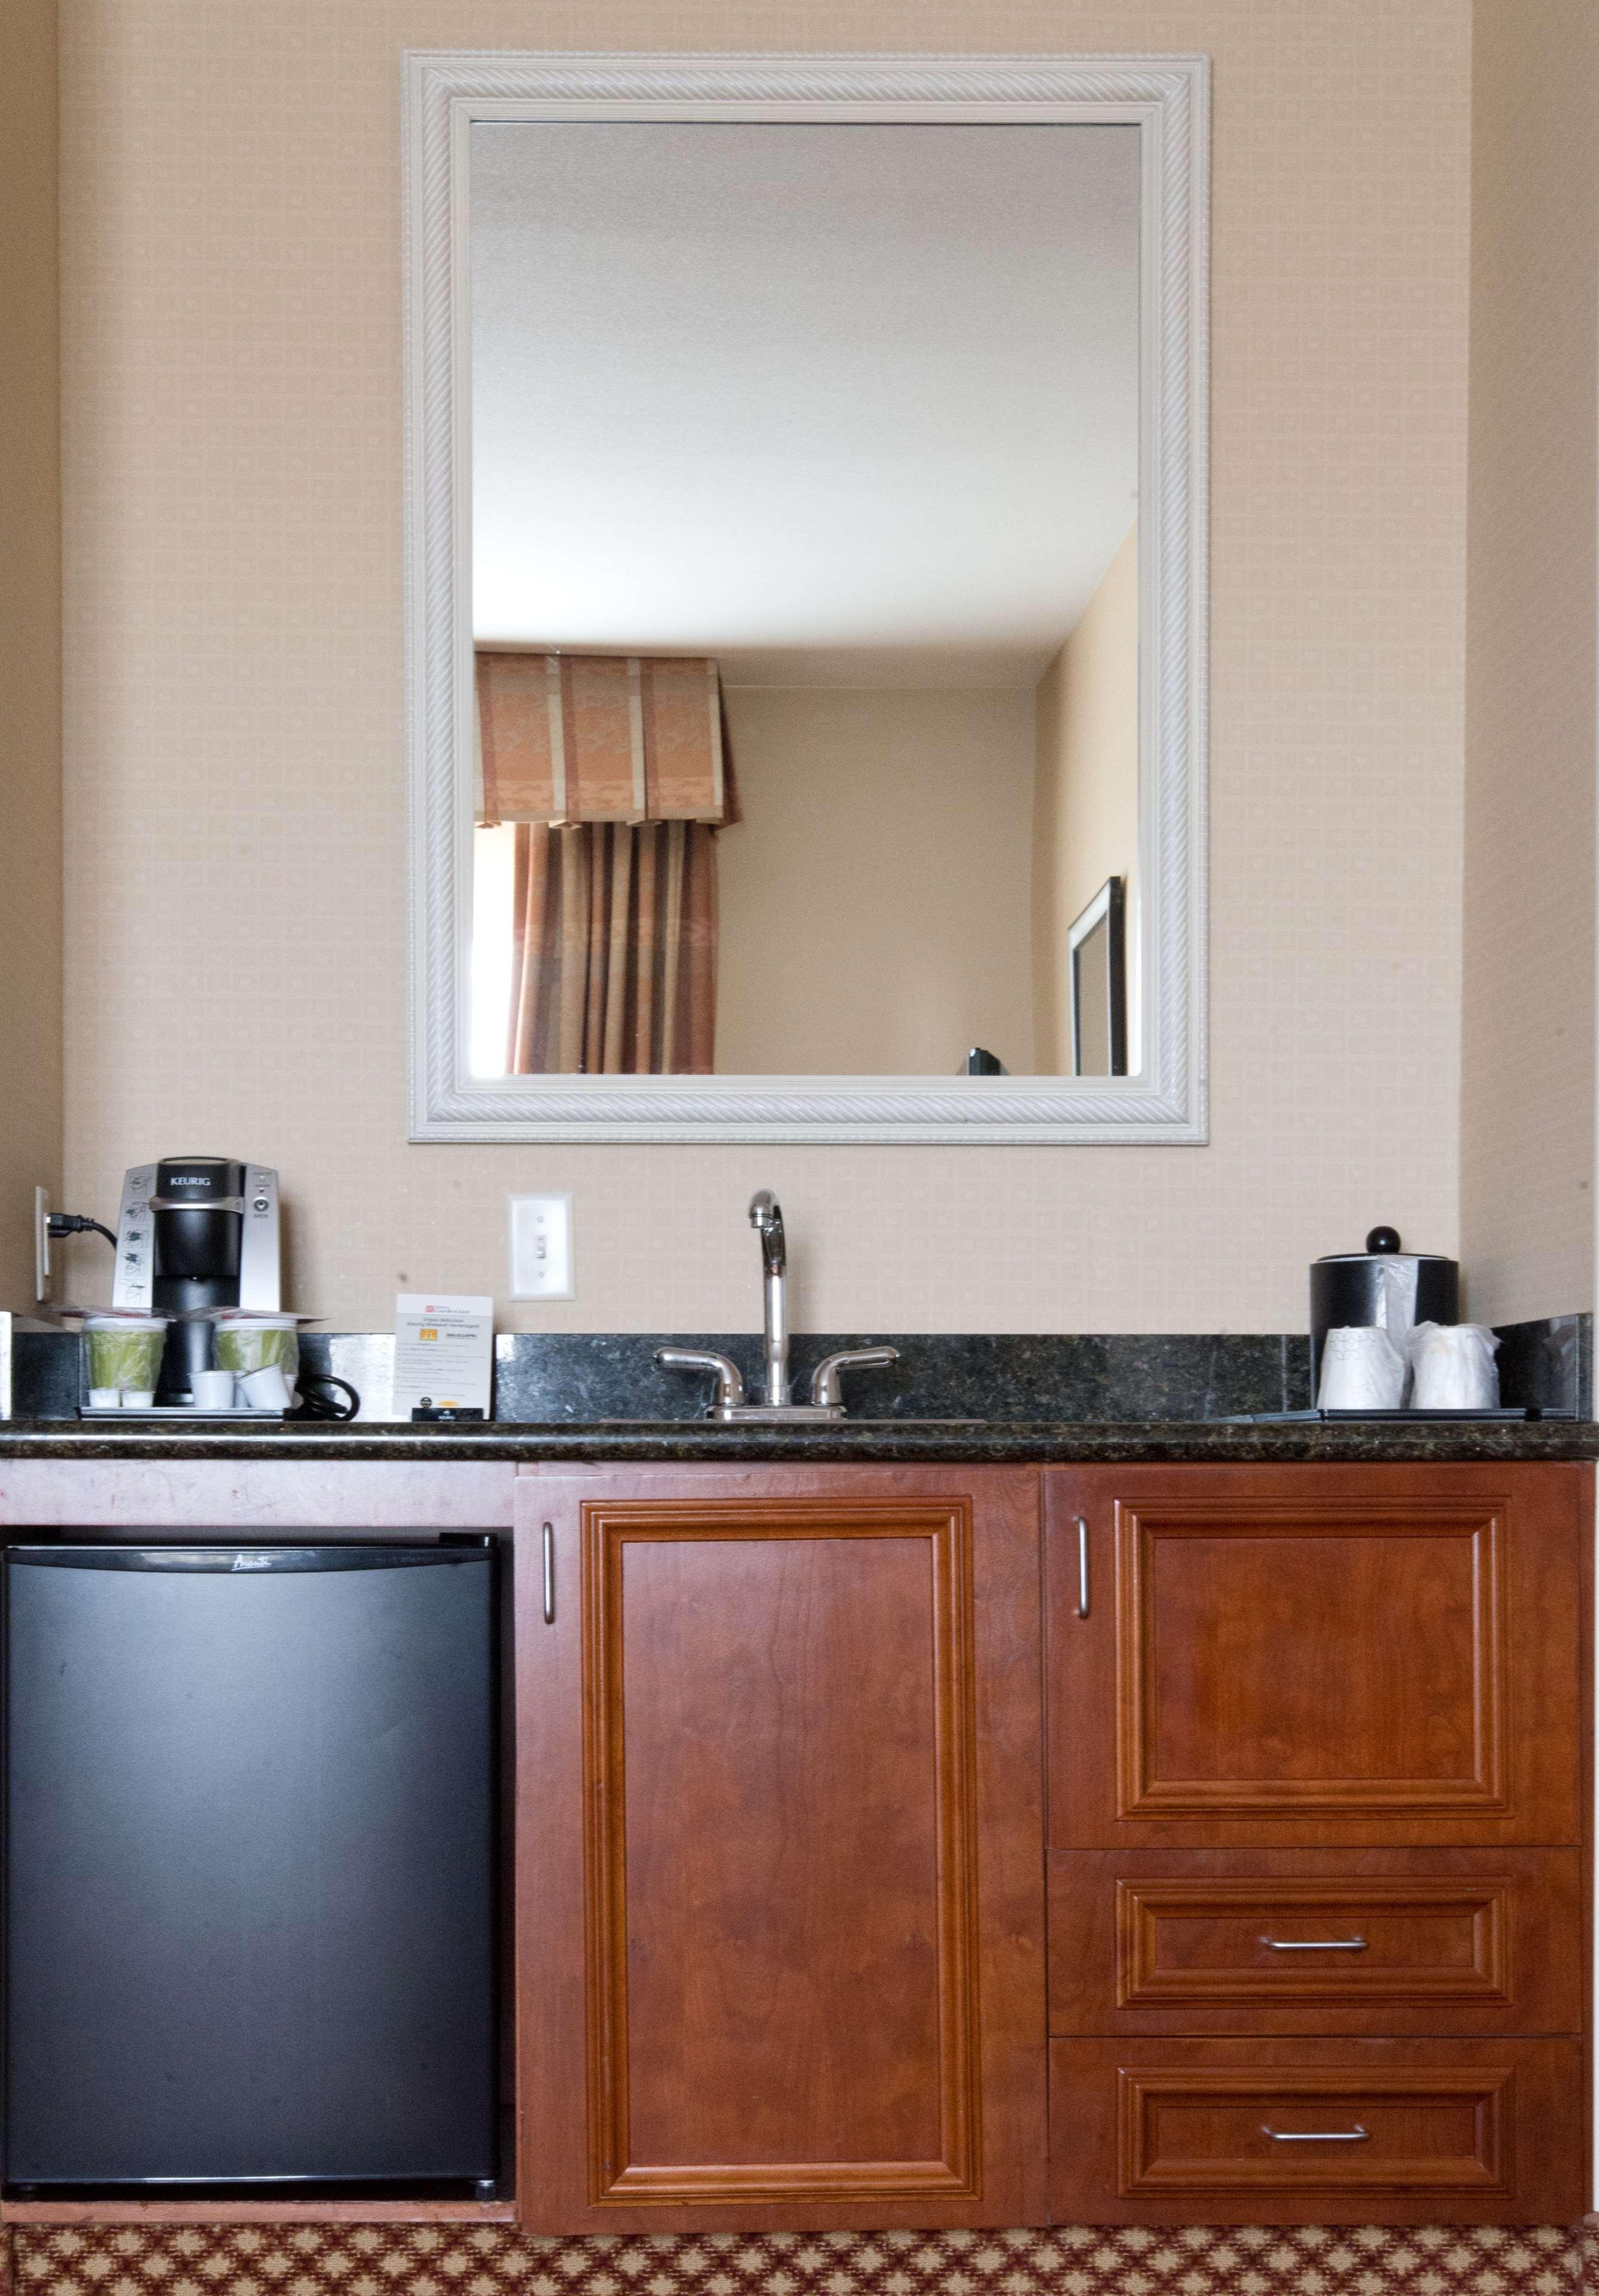 Hilton Garden Inn Laramie image 21